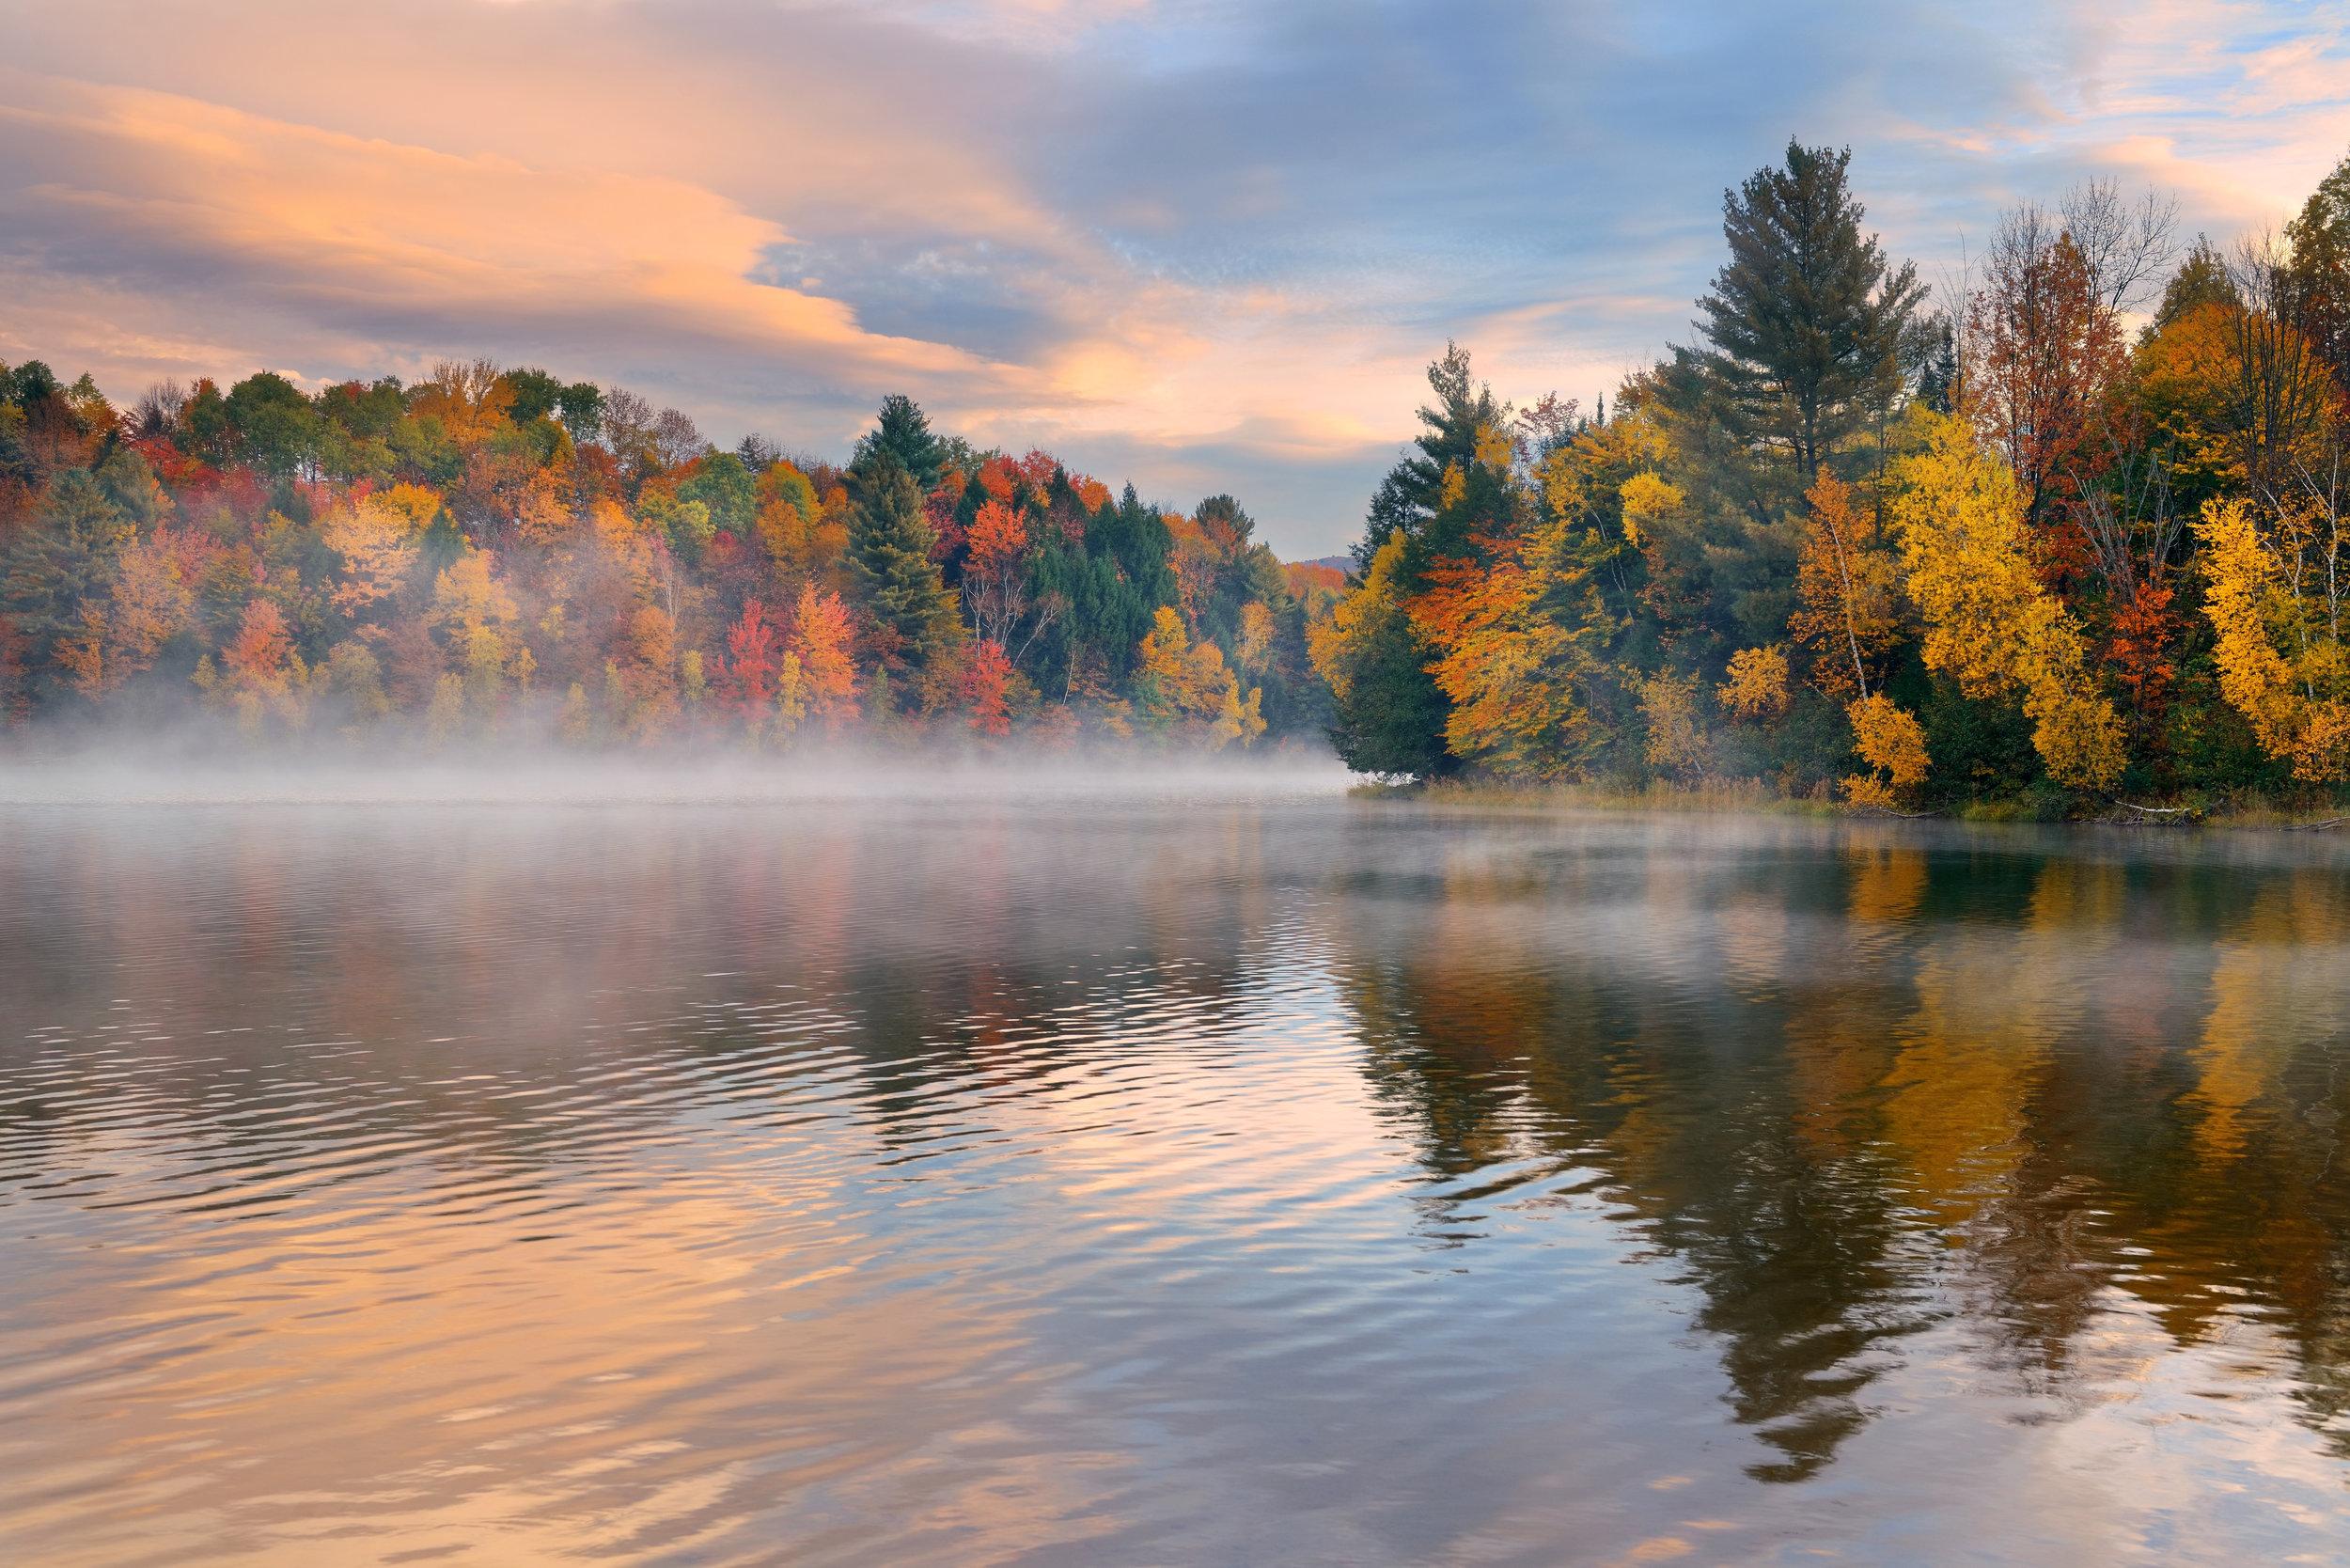 Through The Heart Of New England - 15 September 2018